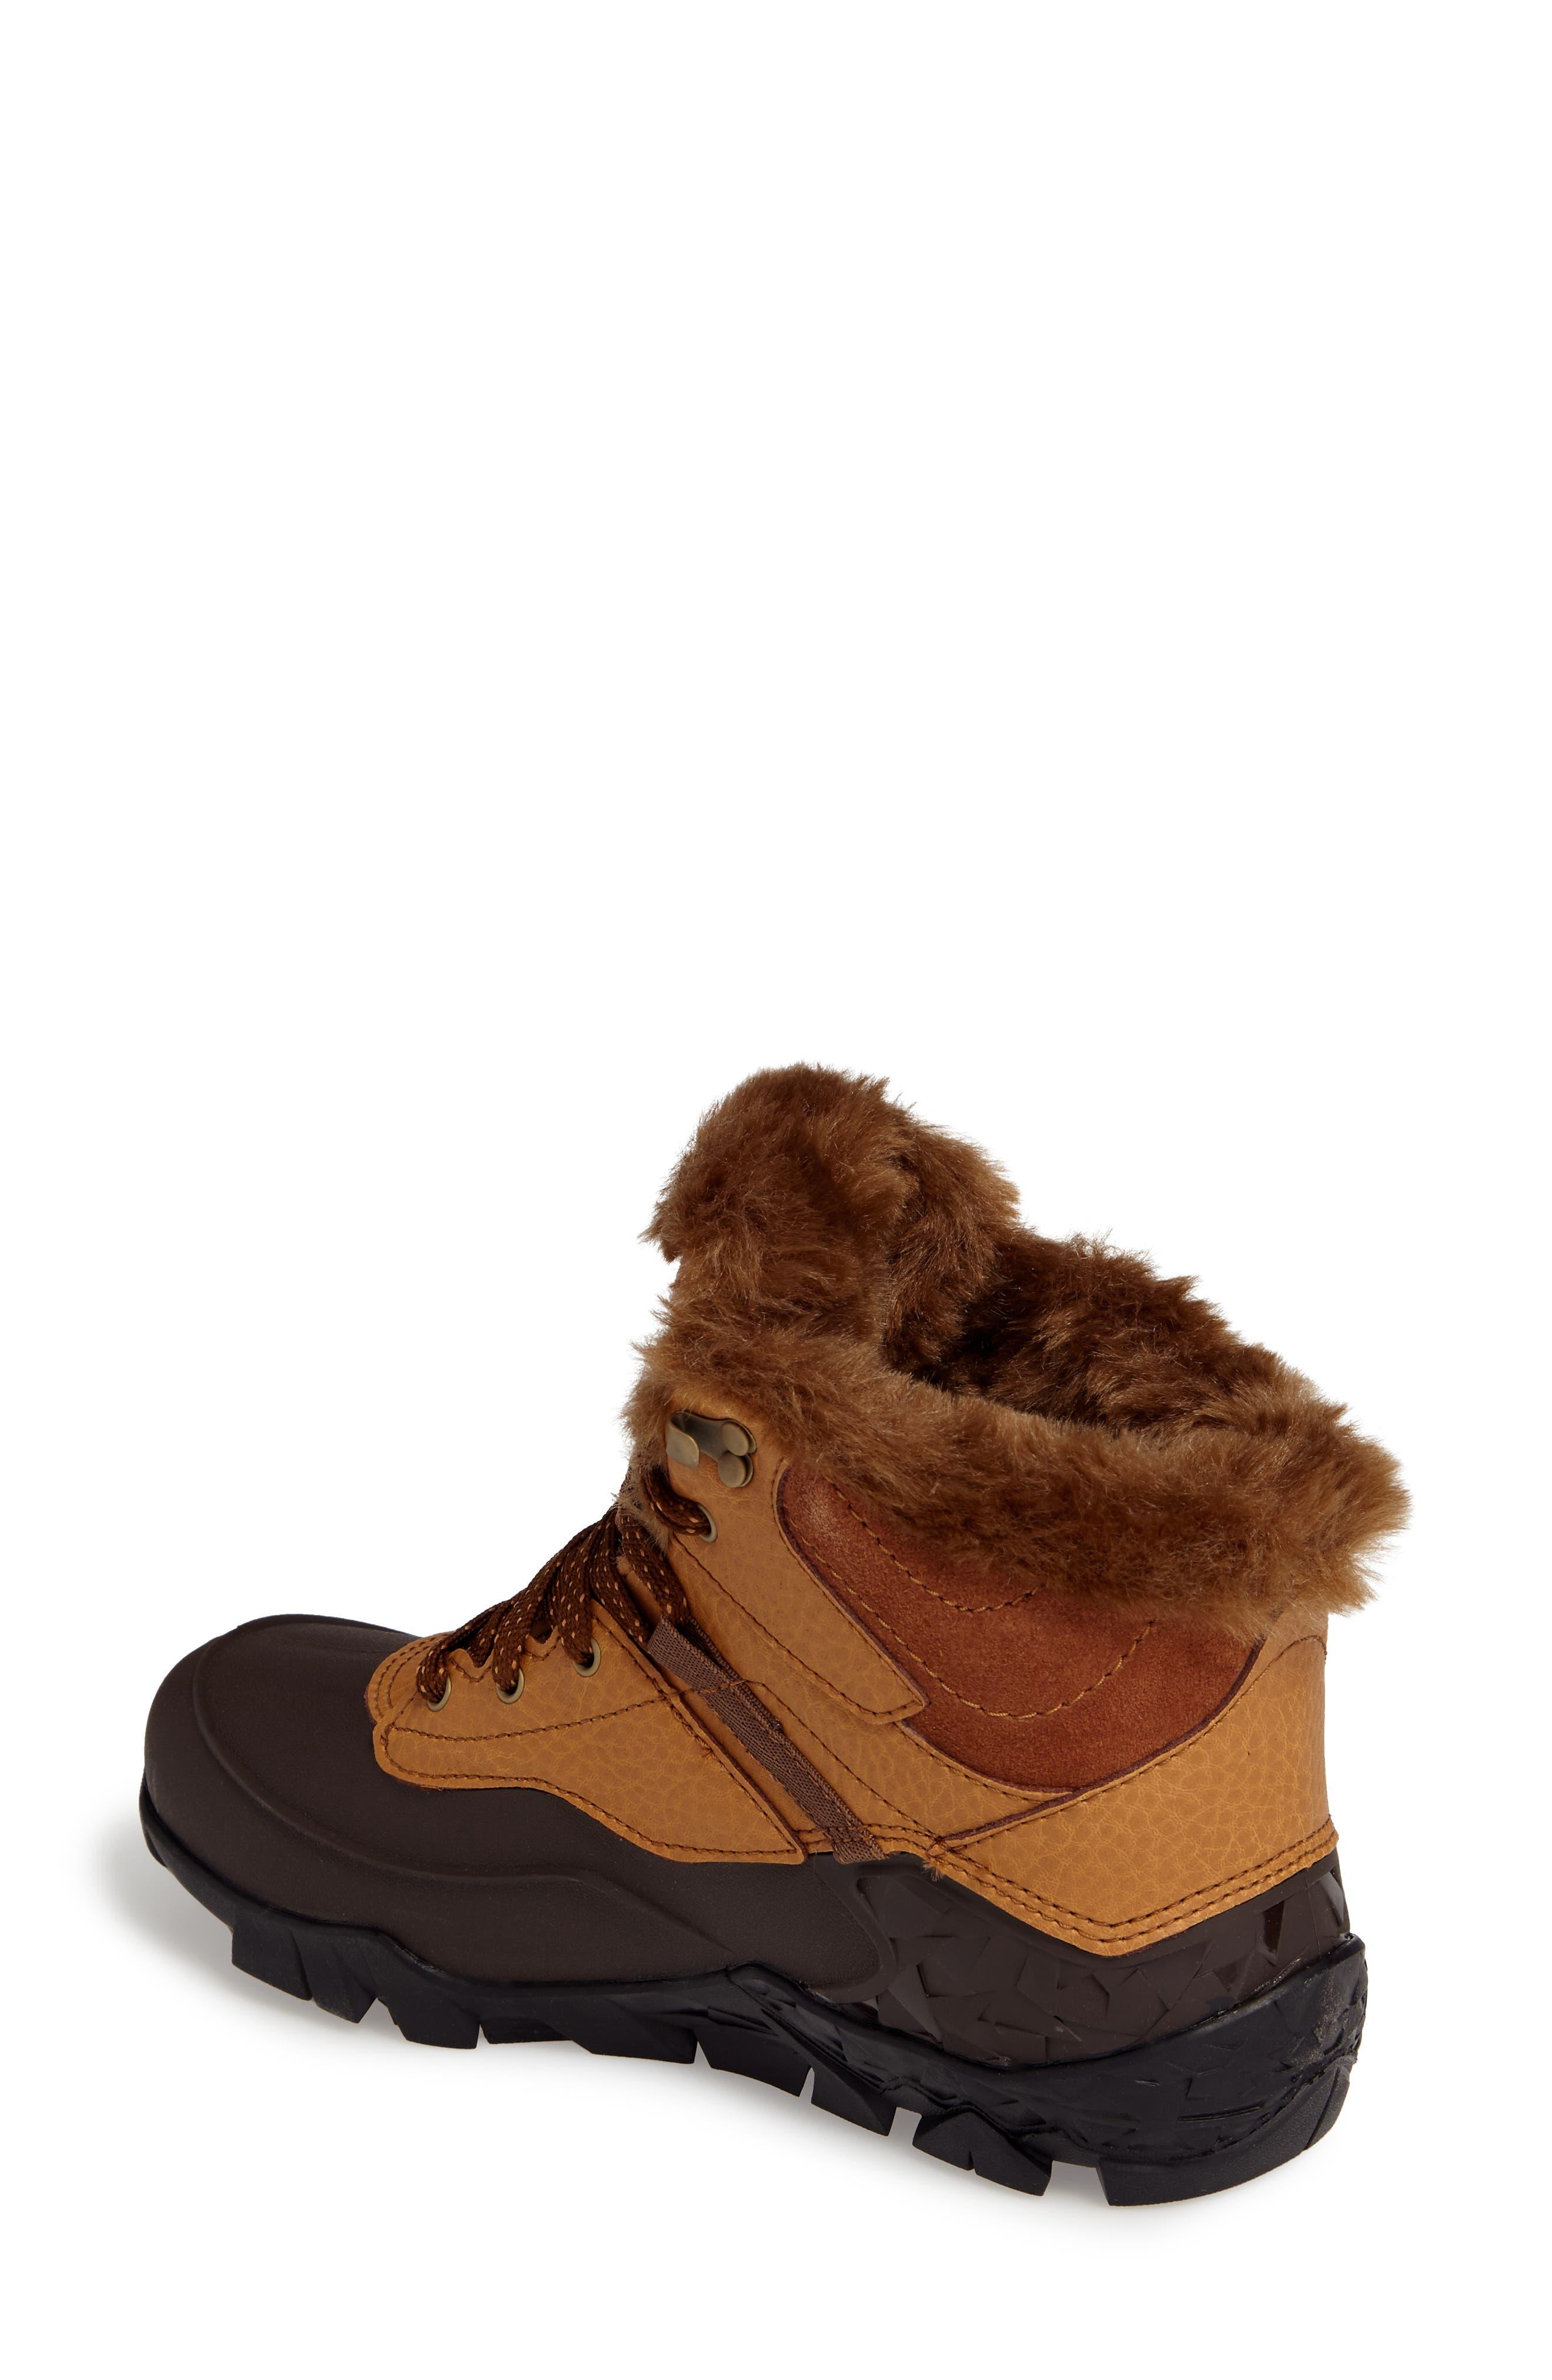 MERRELL, Aurora 6 Ice+ Waterproof Boot, Alternate thumbnail 2, color, TAN FABRIC